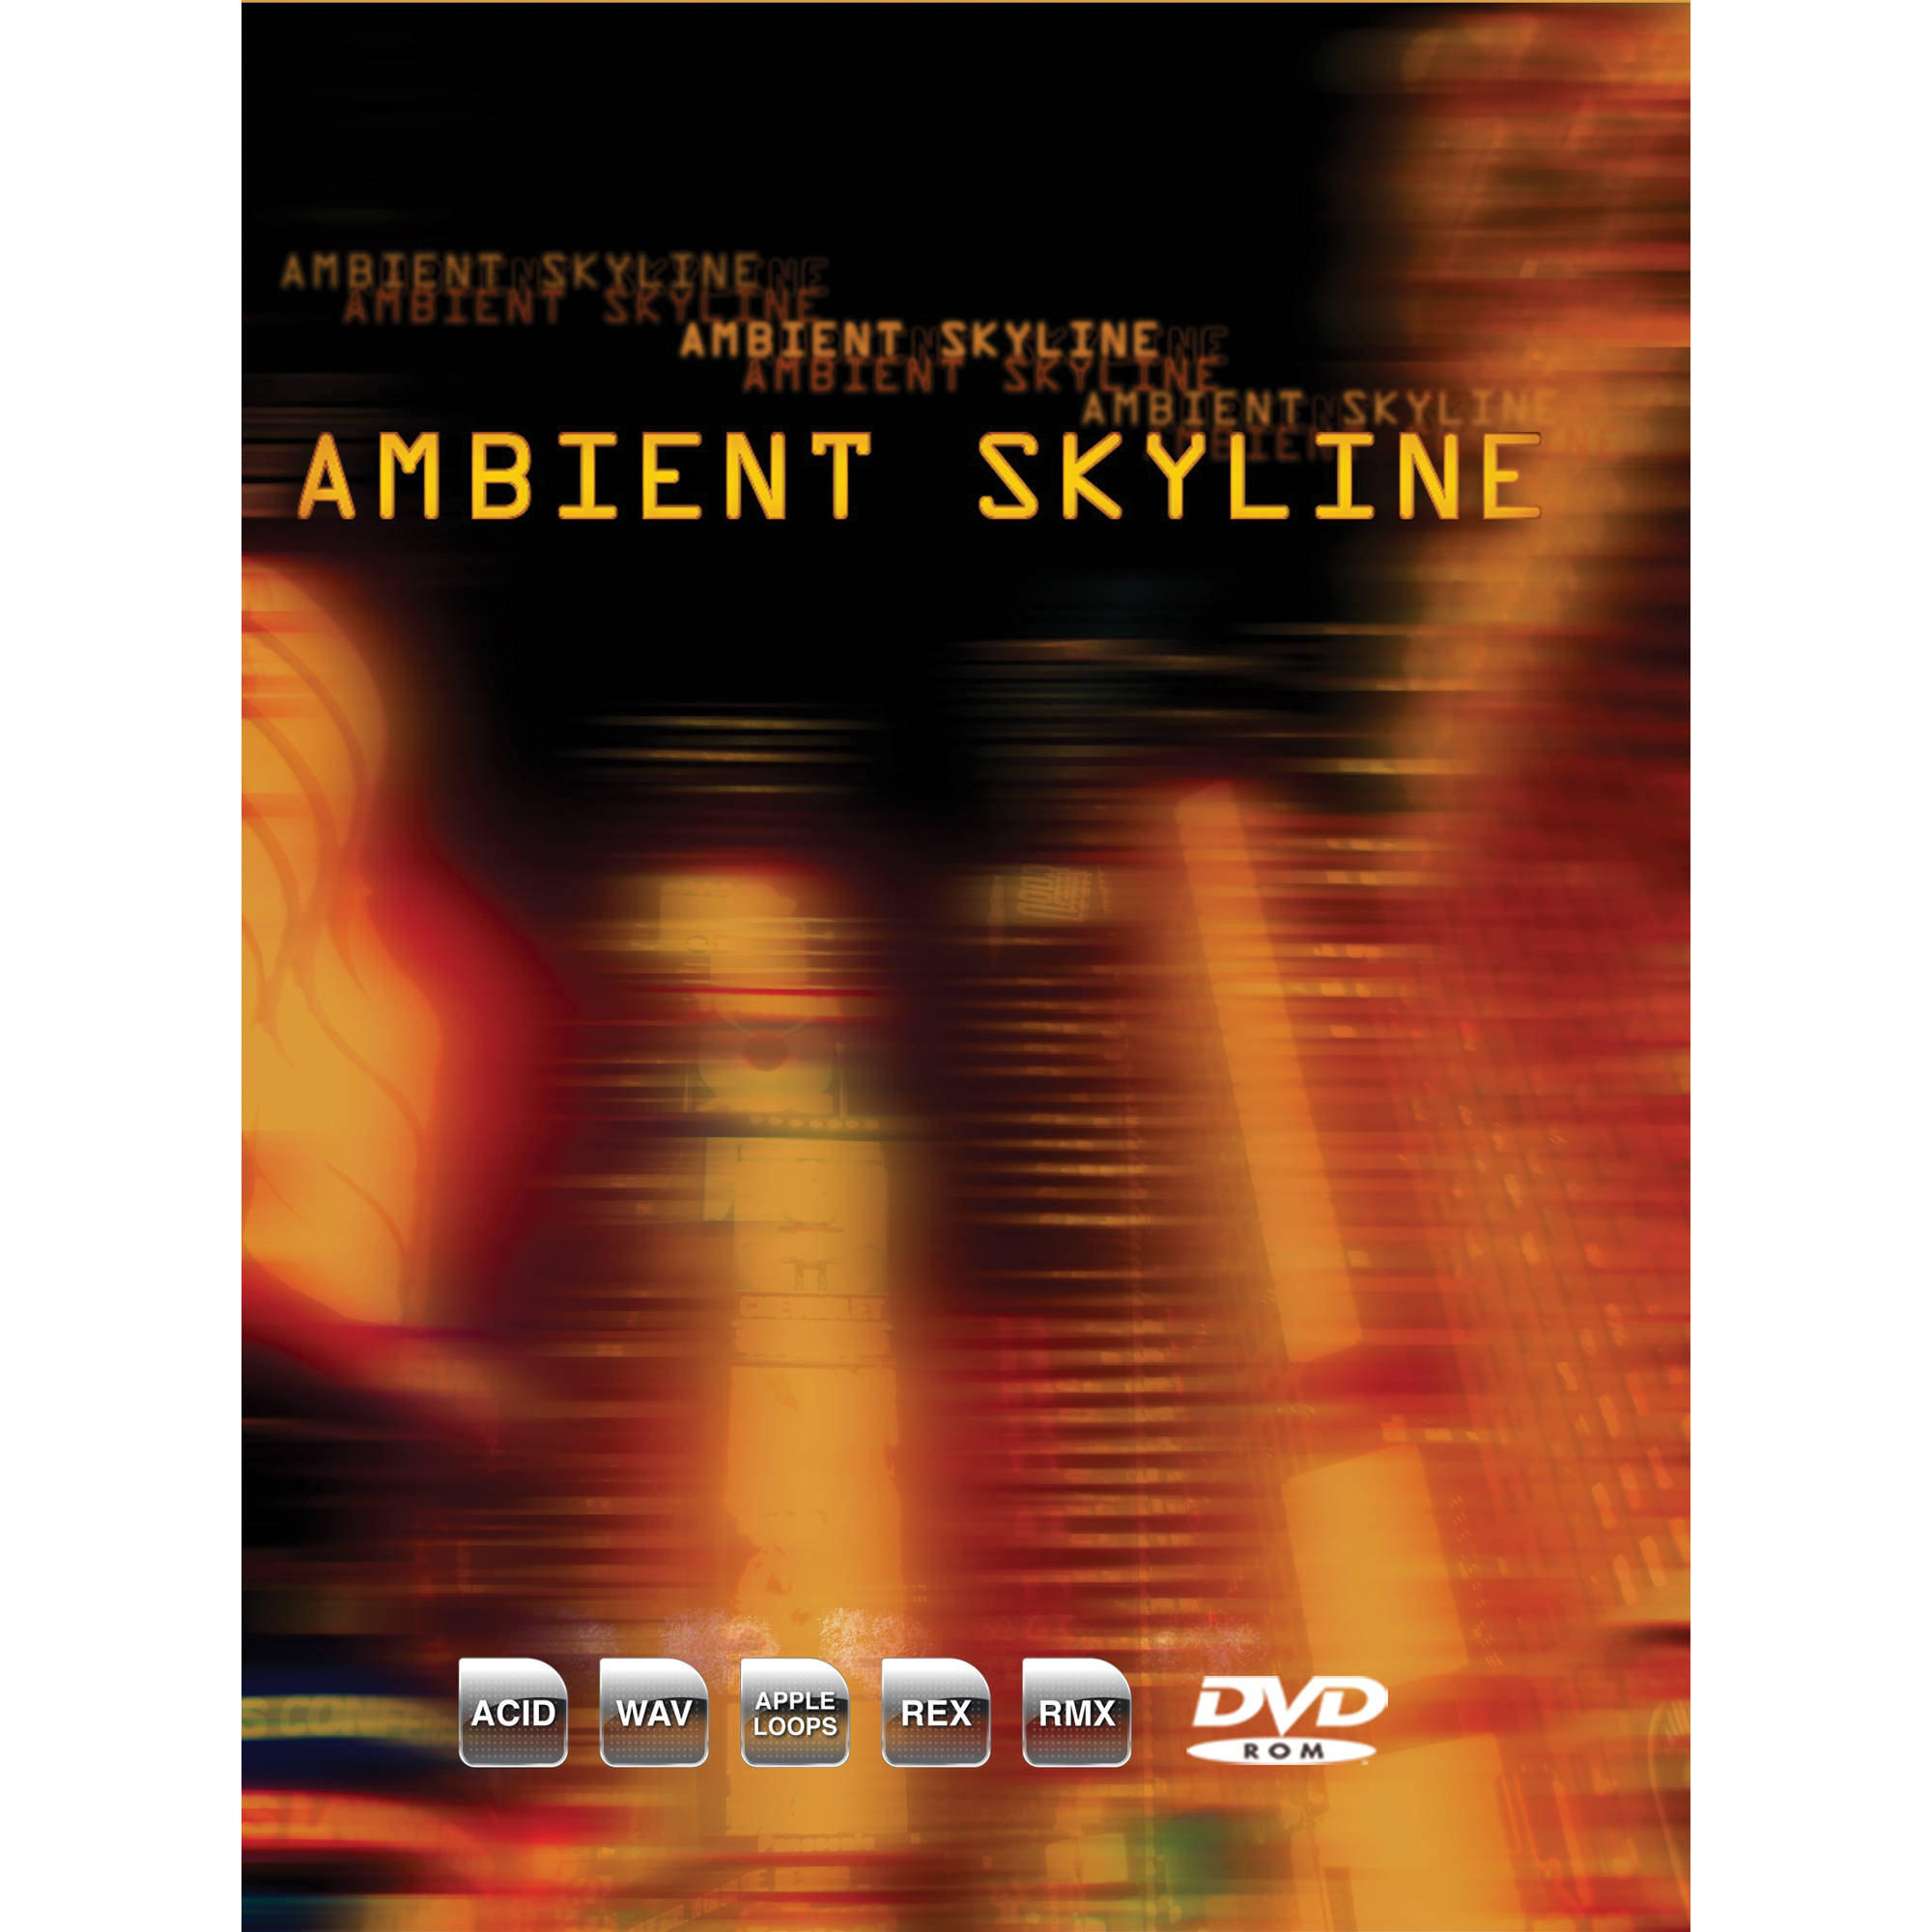 Big fish audio ambient skyline dvd absl1 orwxz b h photo video for Big fish audio